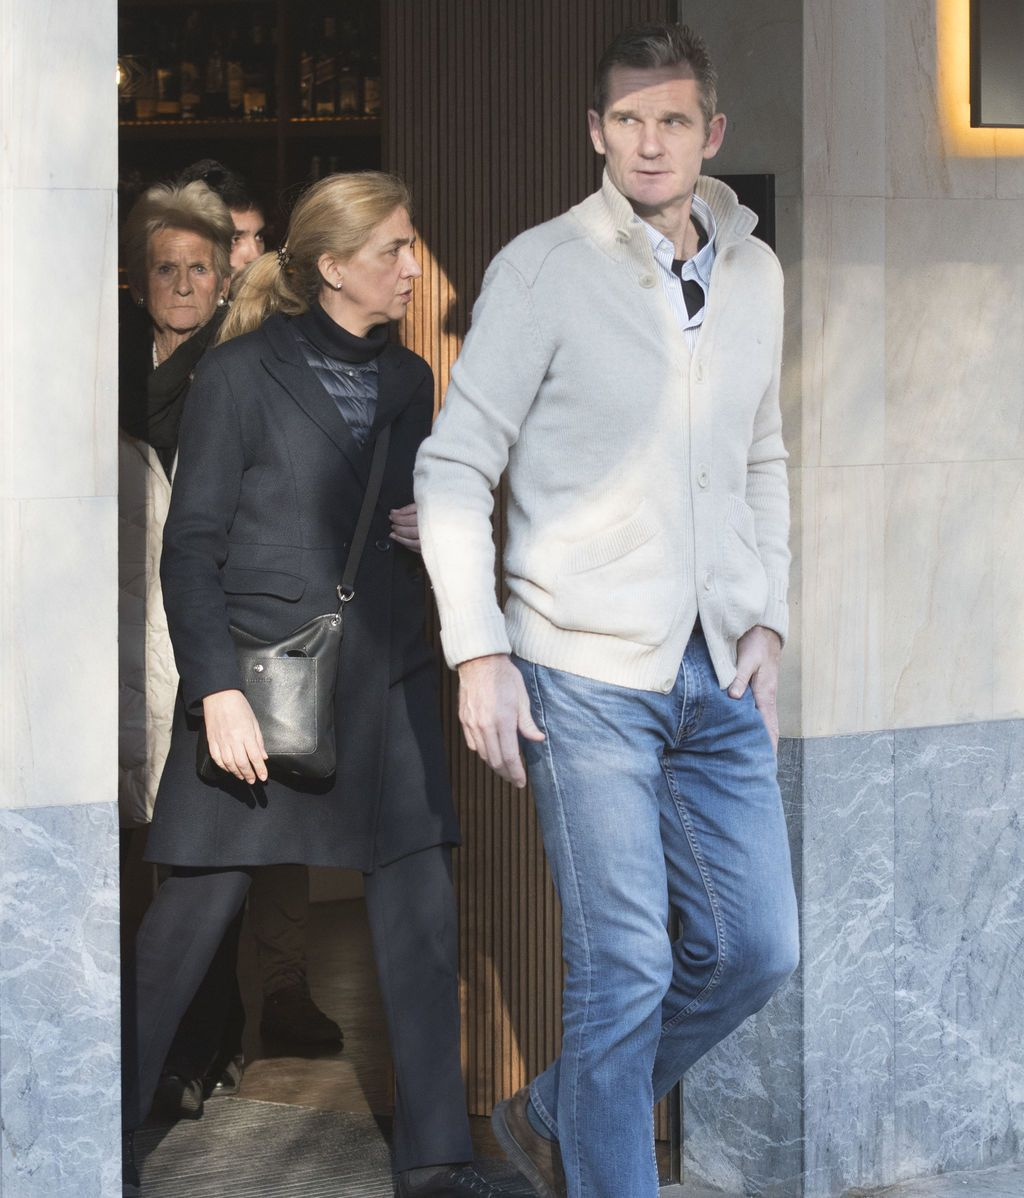 Iñaki Urdangarín disfruta sus últimas horas en libertad junto a la Infanta Cristina en Vitoria